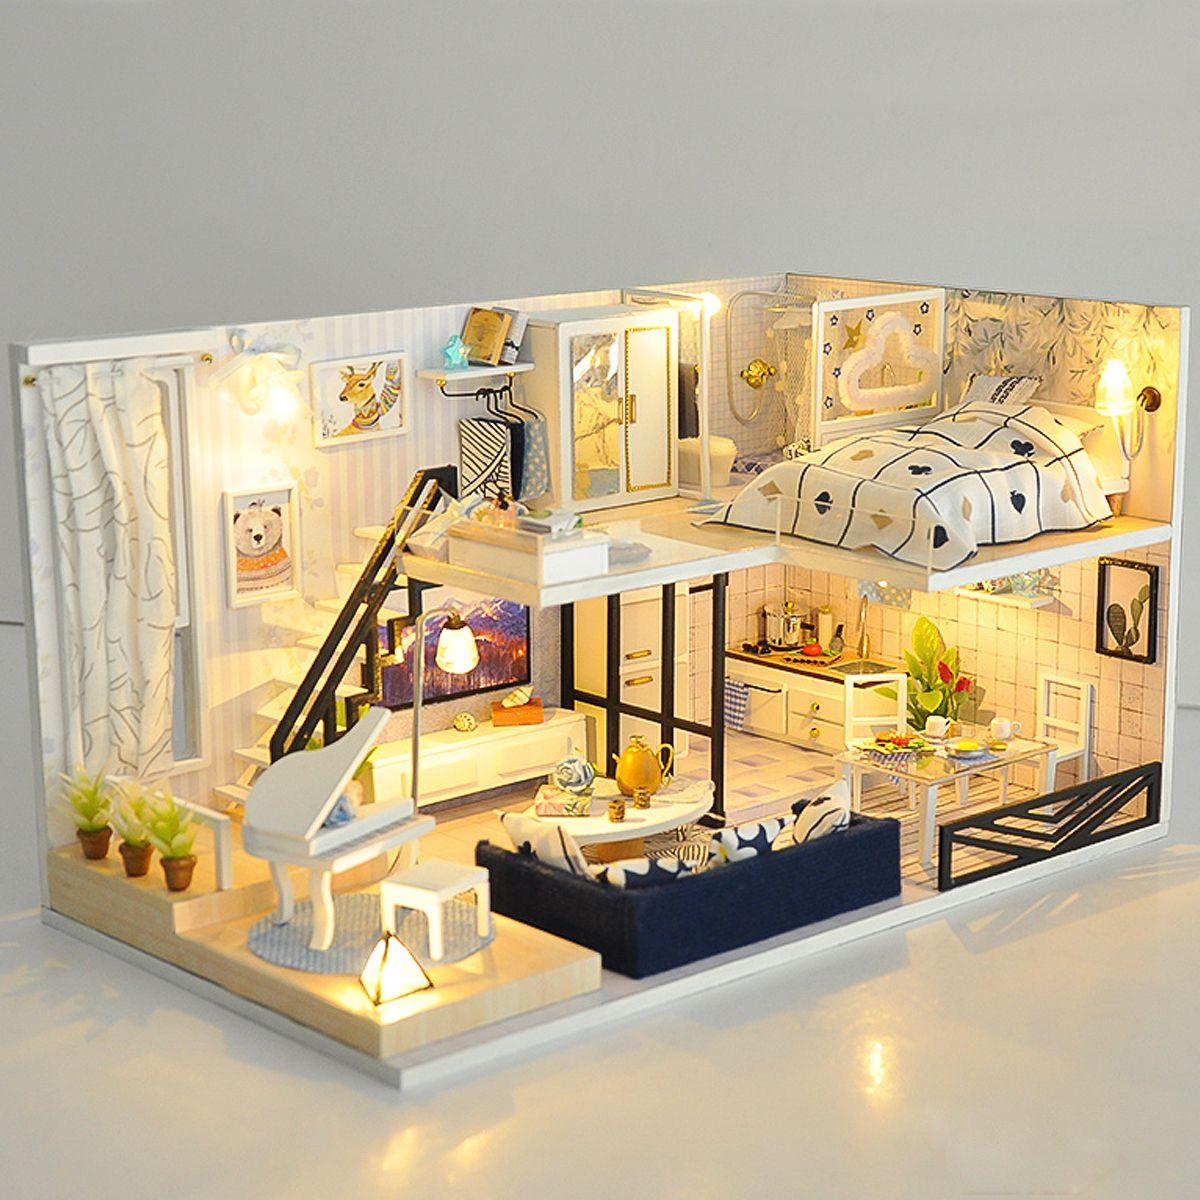 Christmas gift doll house miniature diy handcraft kit 3d